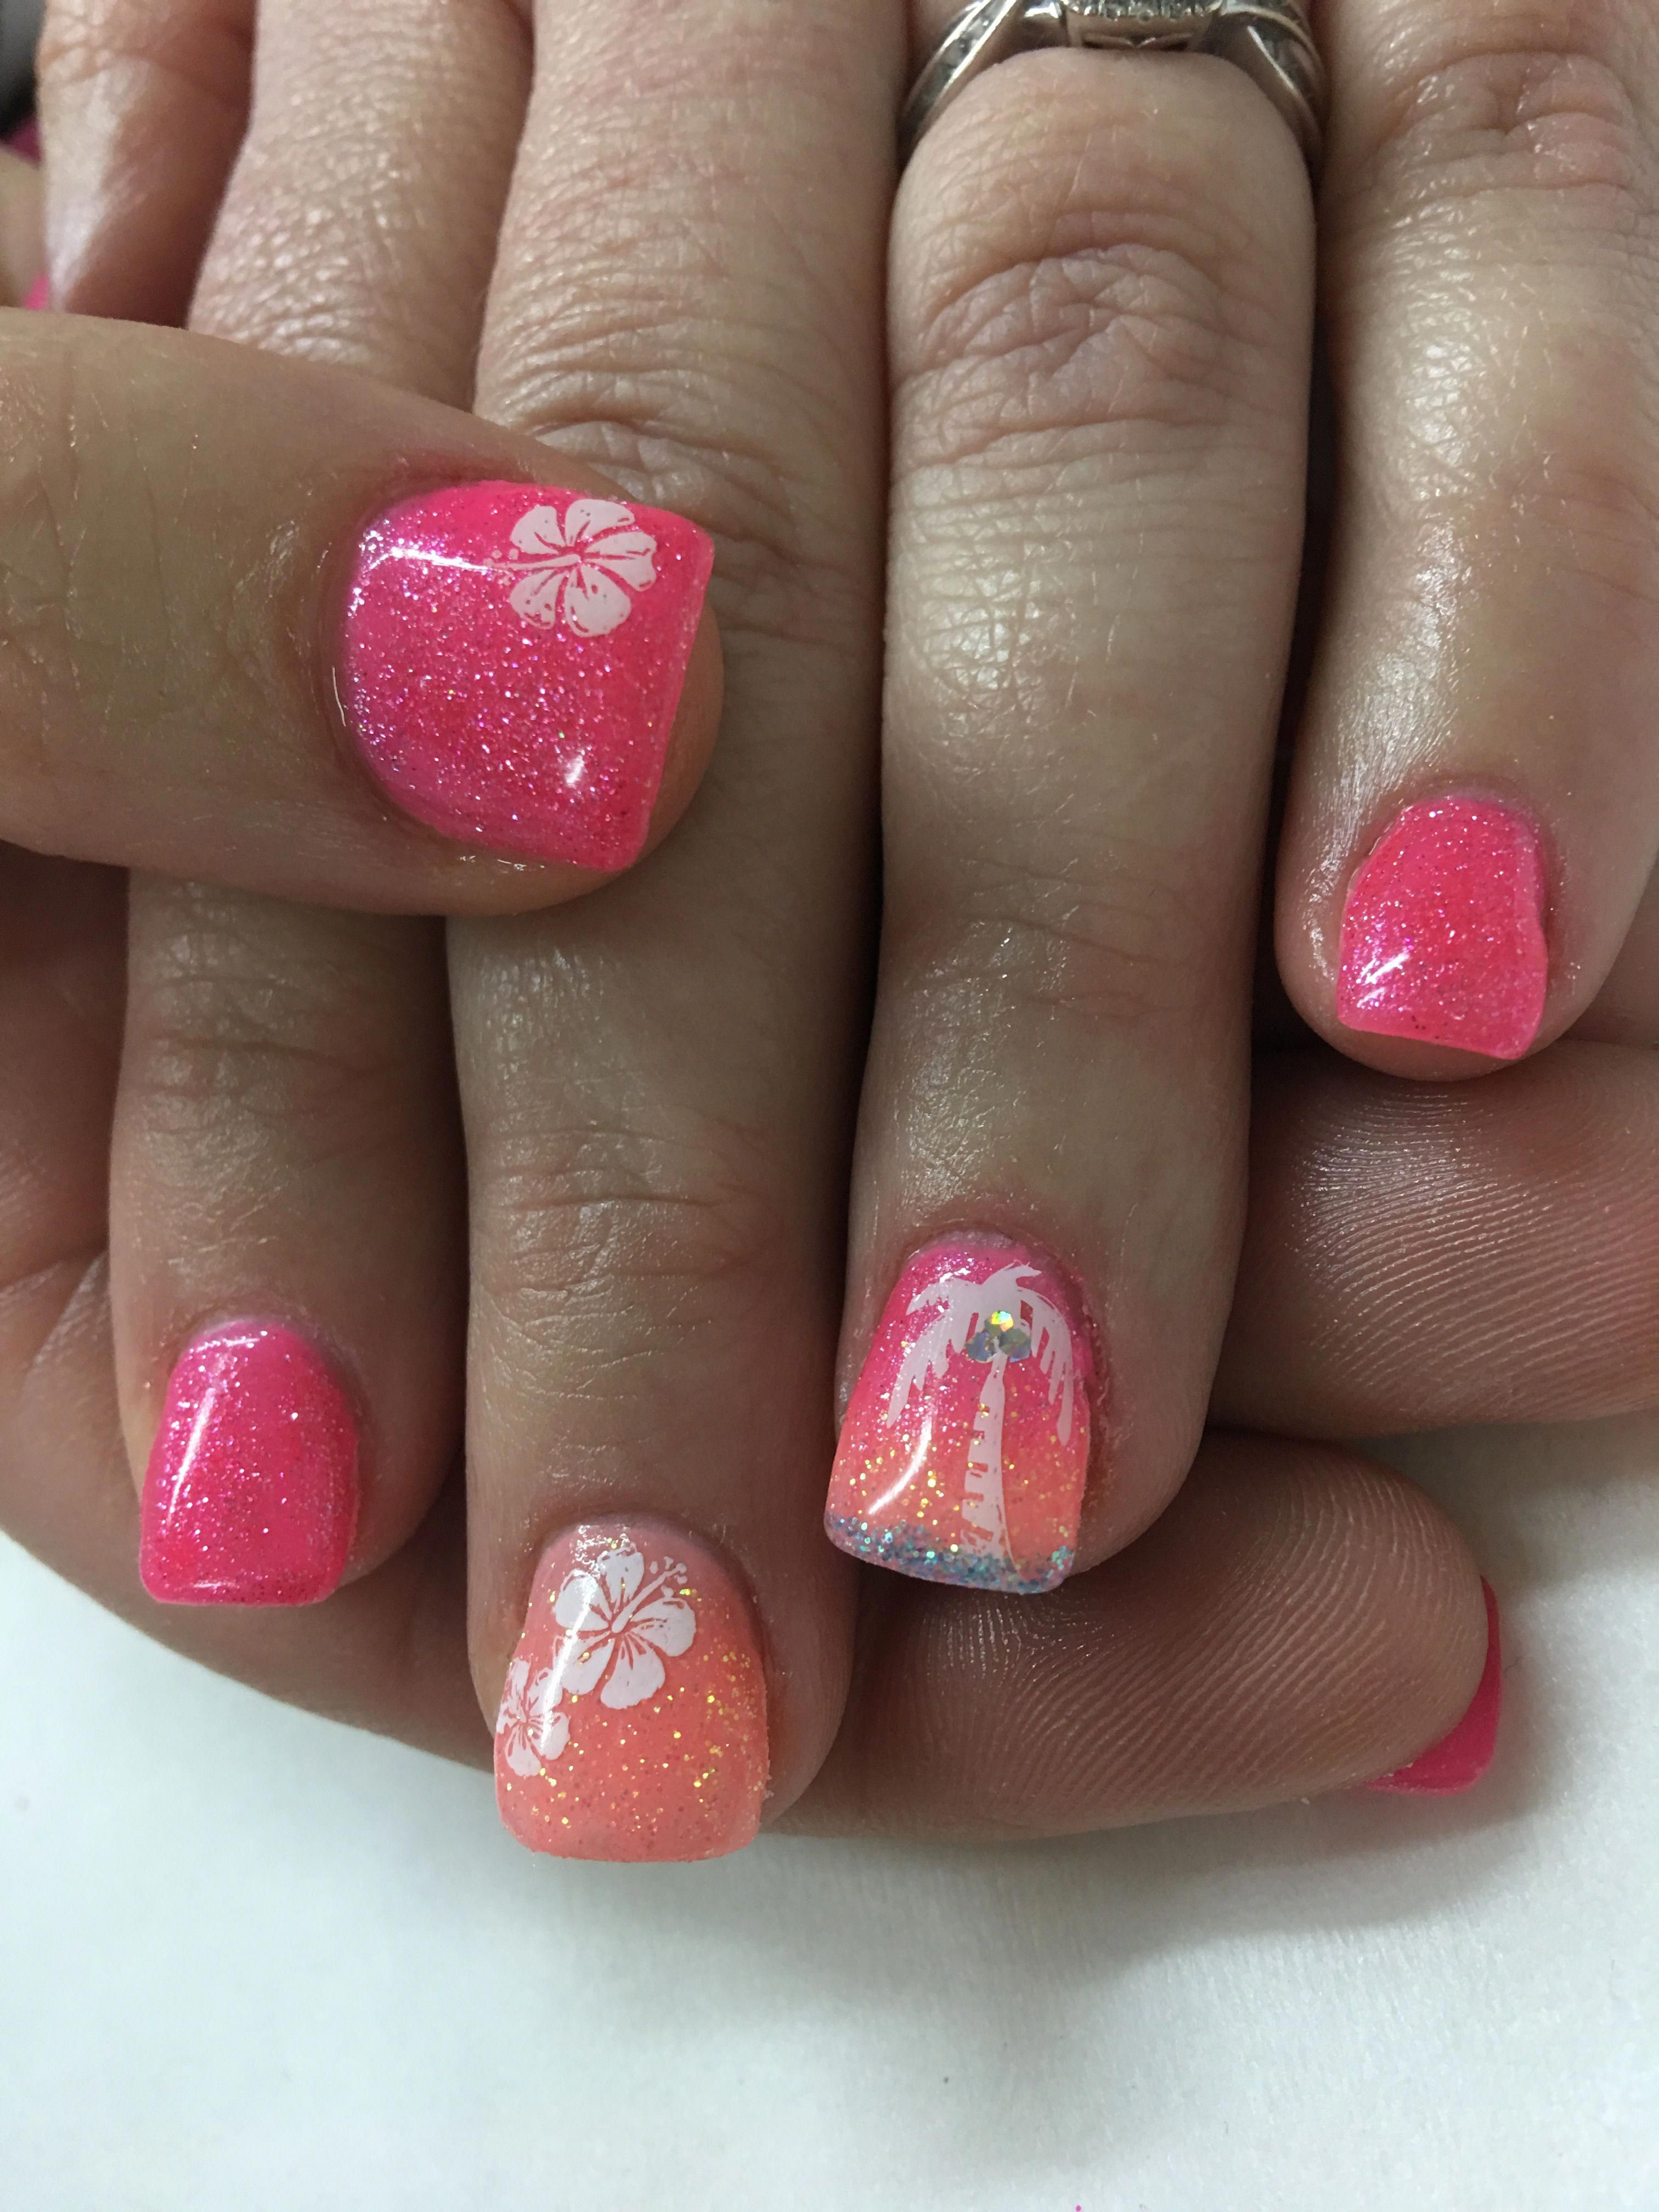 Christmas Nails For Beautiful Holiday Fashion With Images Tropical Nails Beach Nails Gel Nail Art